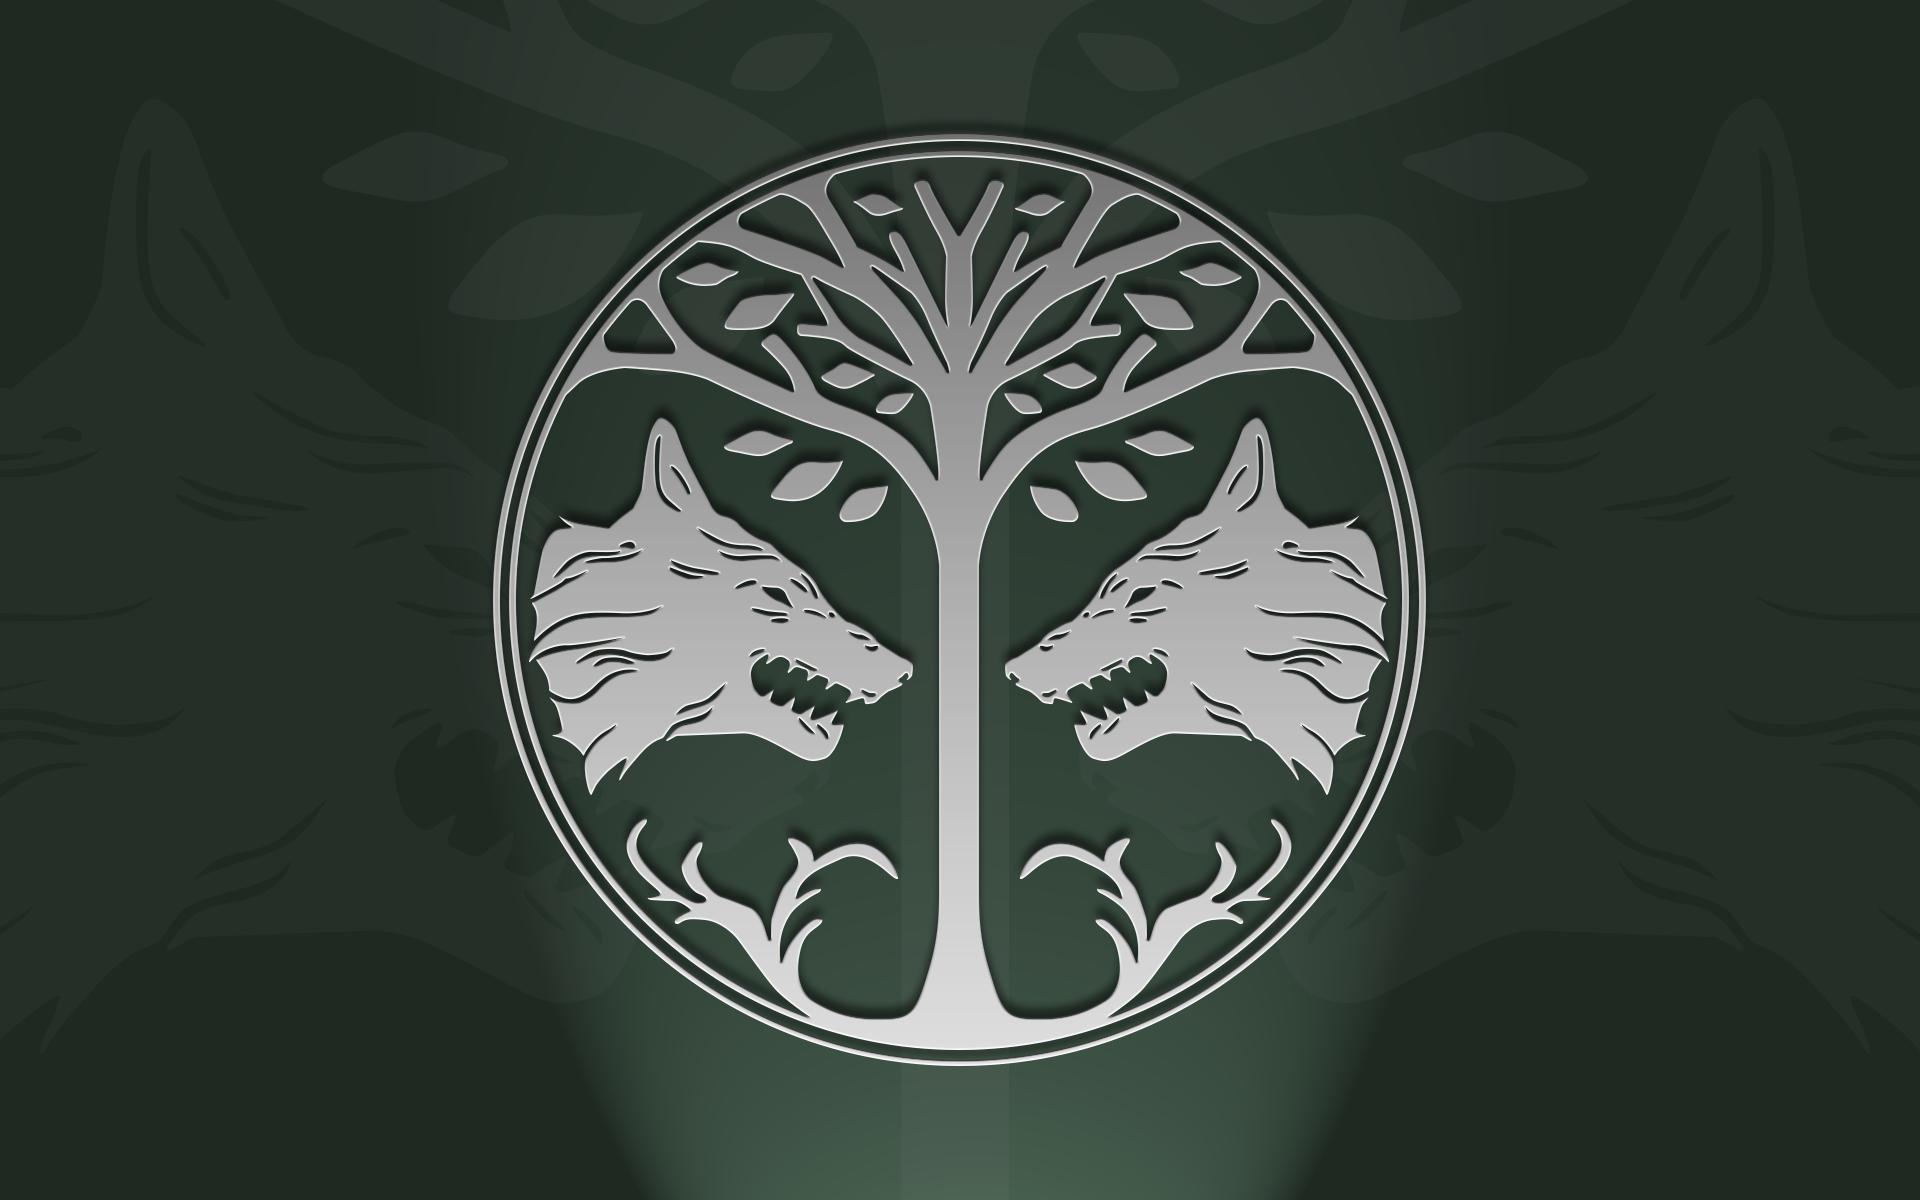 Destiny warlock stormcaller logo clipart graphic library stock Destiny - Iron Banner Wallpaper by OverwatchGraphics on DeviantArt graphic library stock